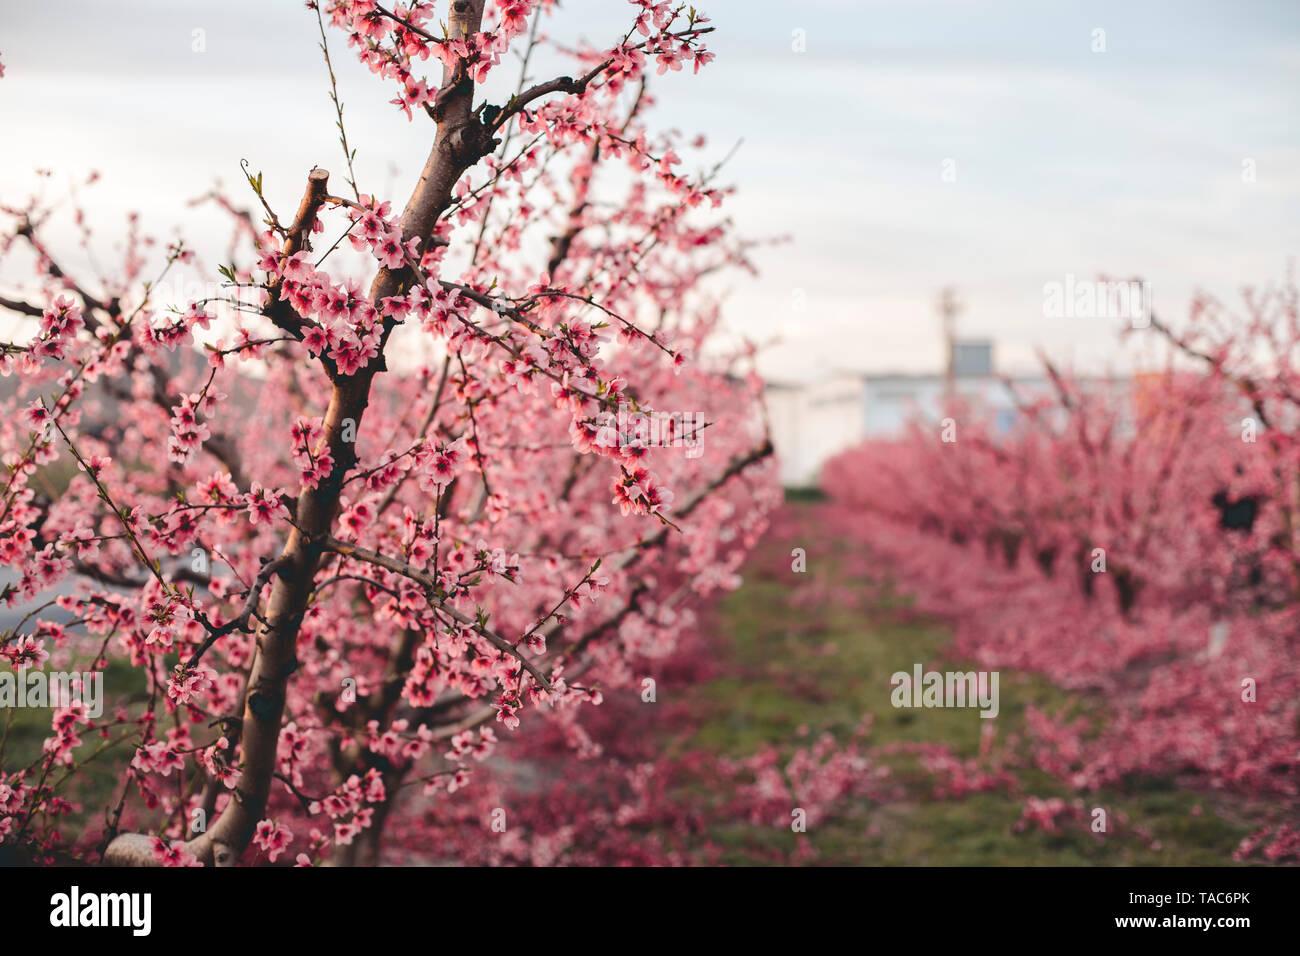 Spain, Lleida, peach blossom - Stock Image